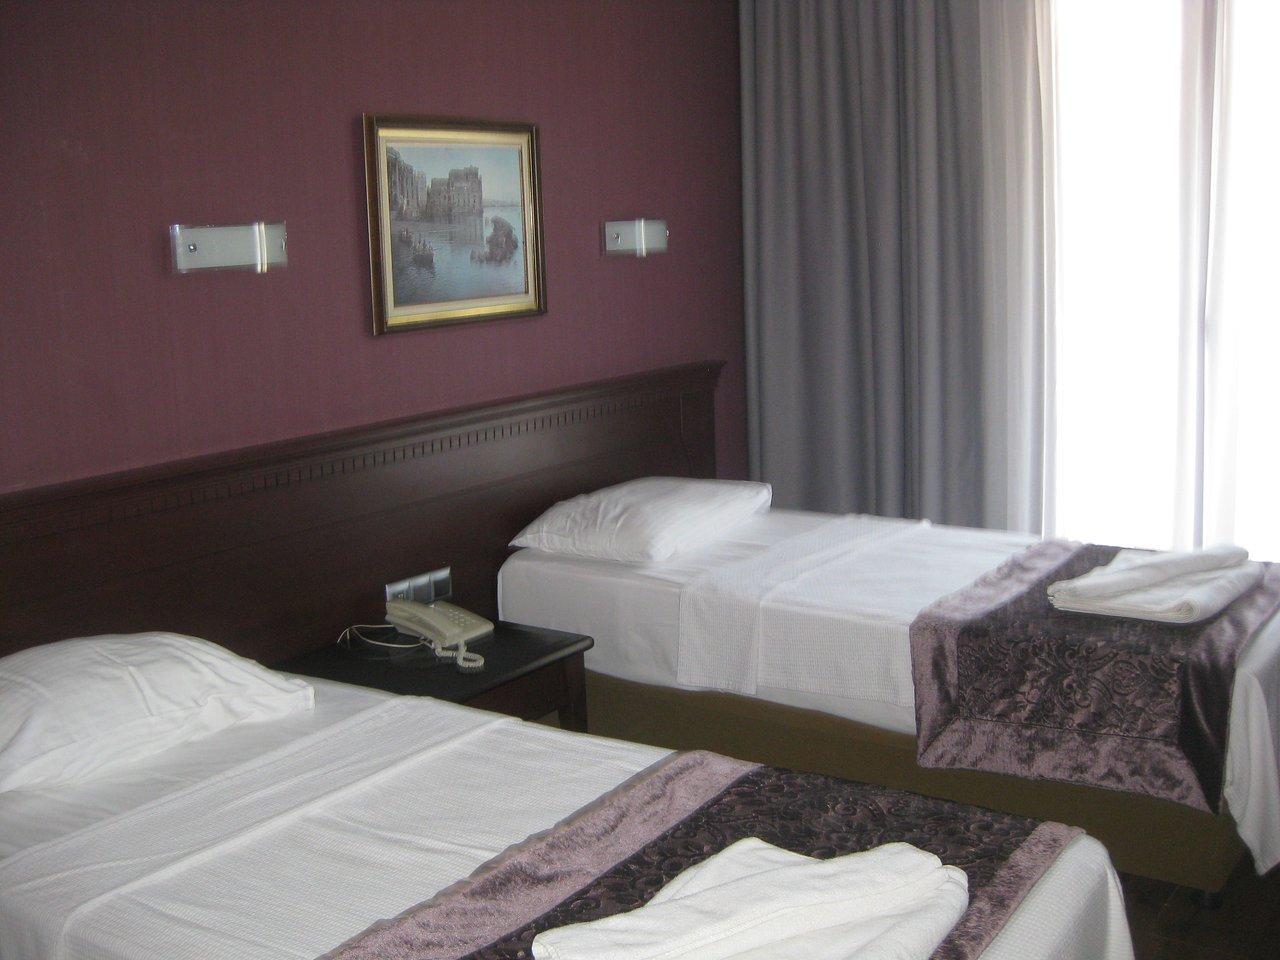 Hotel Club Viva 4 (TurkeyMarmarisArmutalan): photos, room description, service, tips and tourist reviews 17